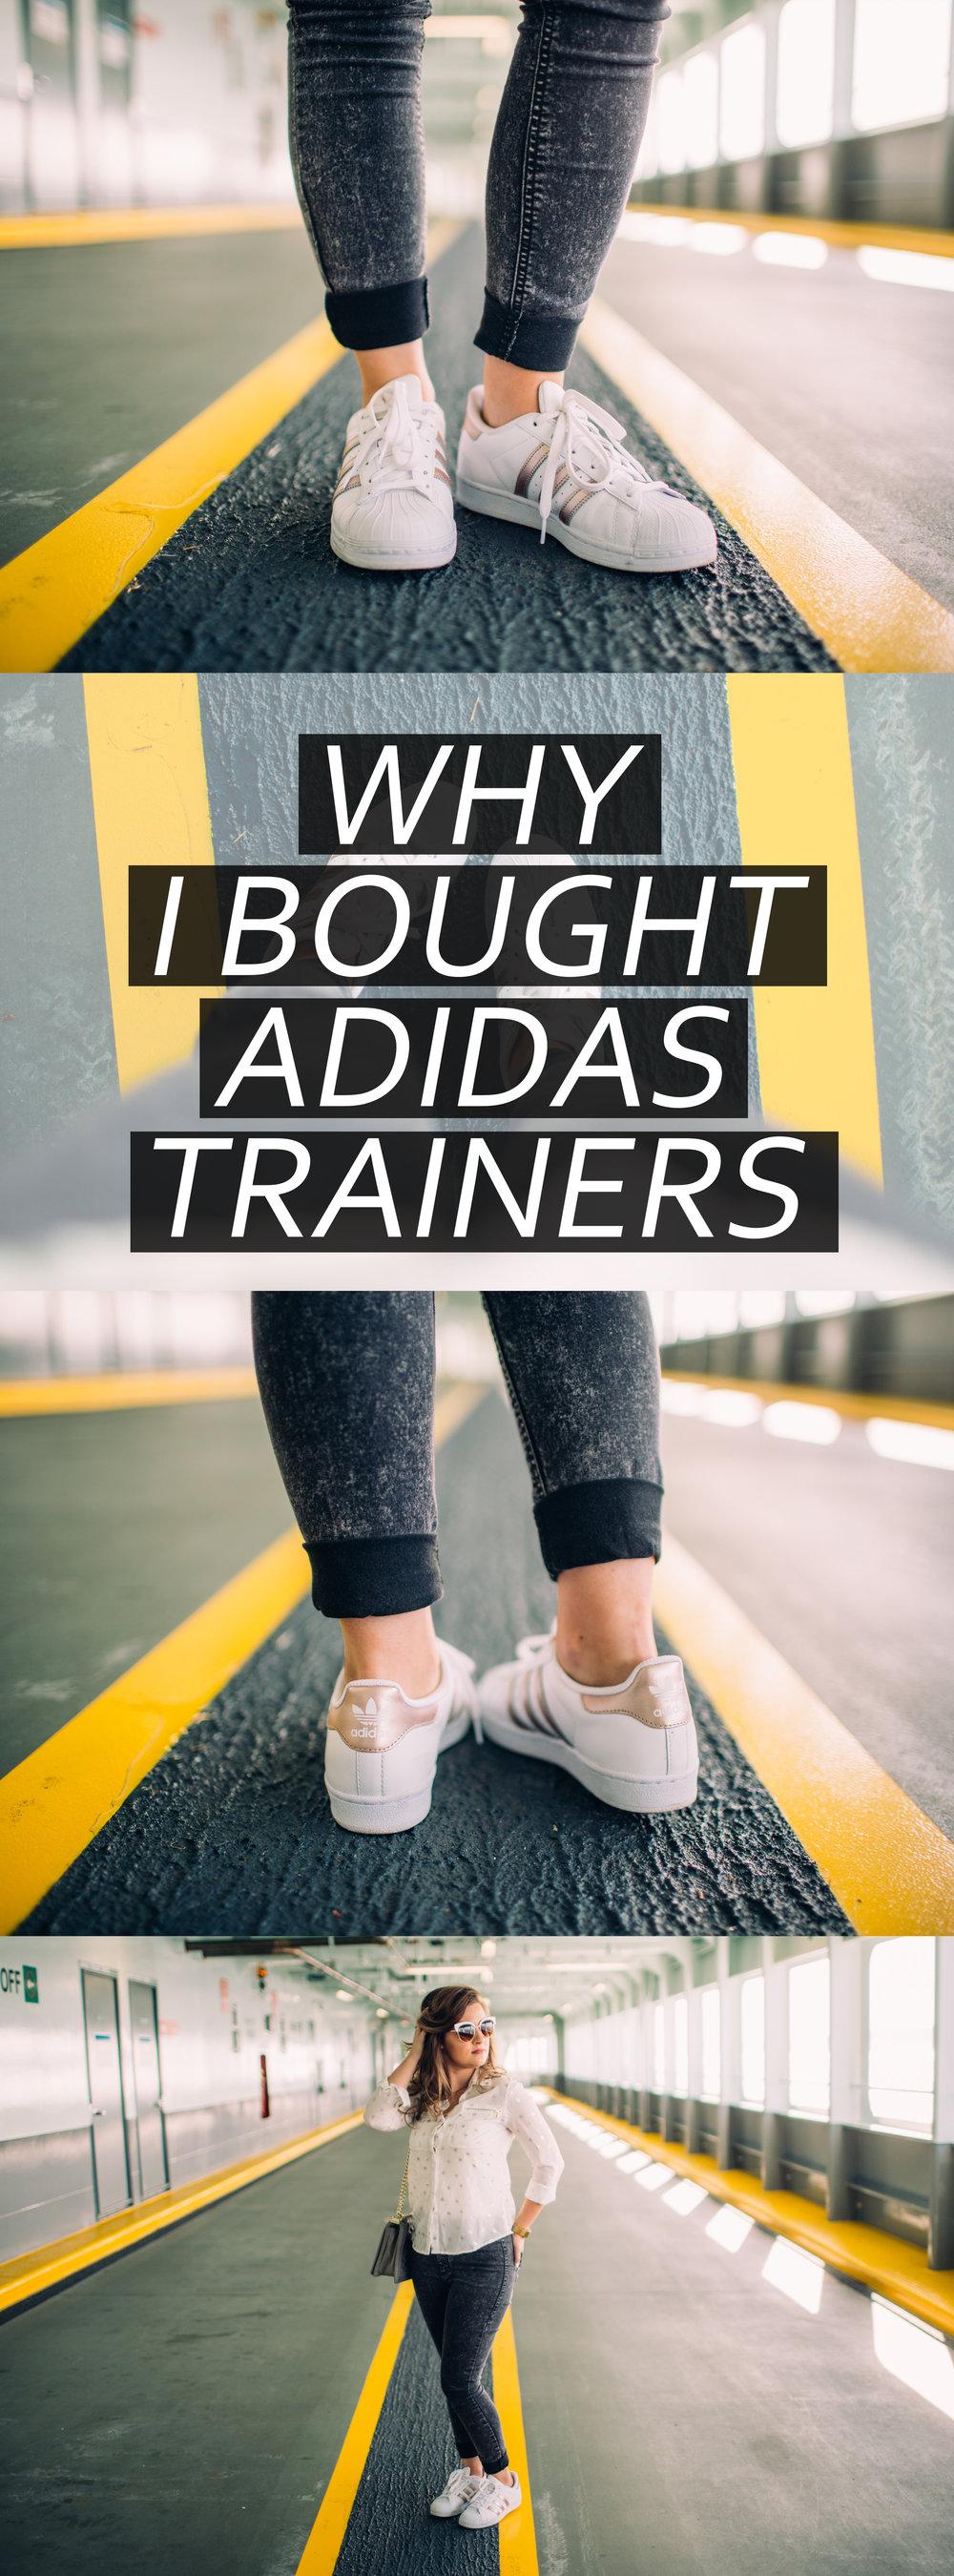 Reasons to Buy Adidas Trainers   Shoe advice